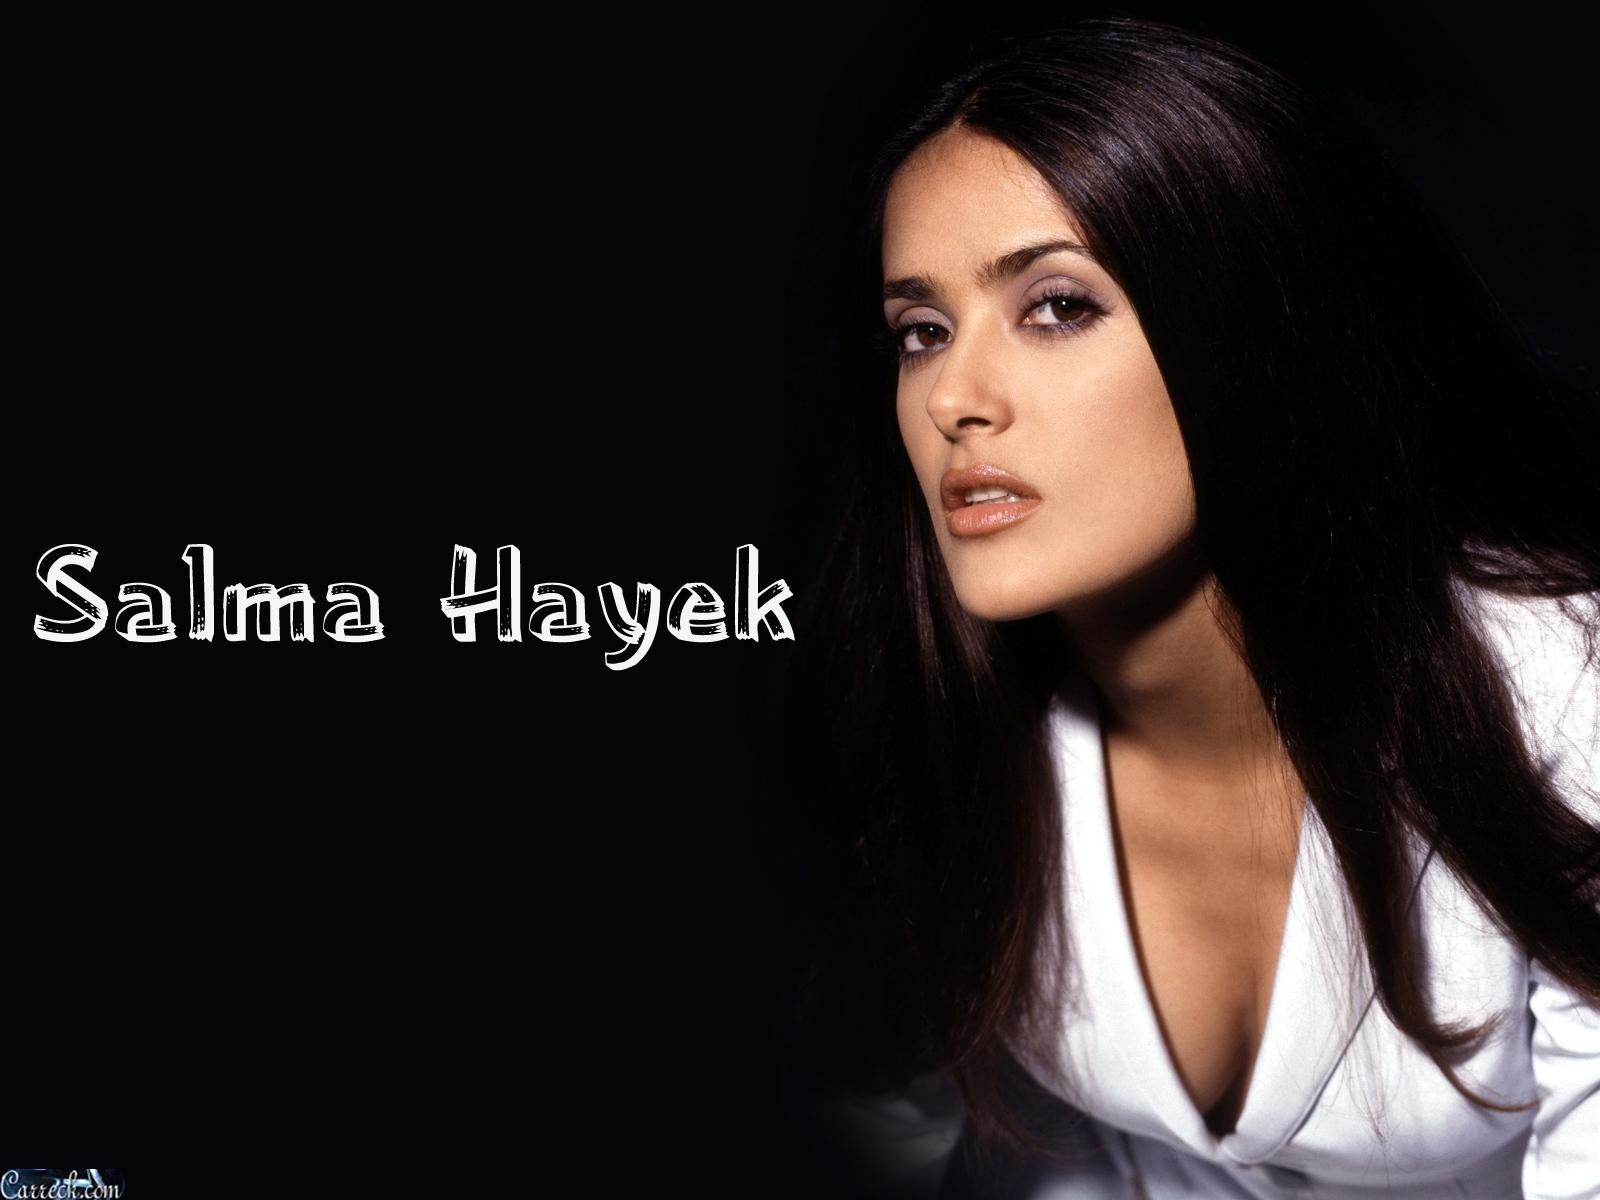 Wikimise: Salma Hayek wiki and pics Milla Jovovich Wiki